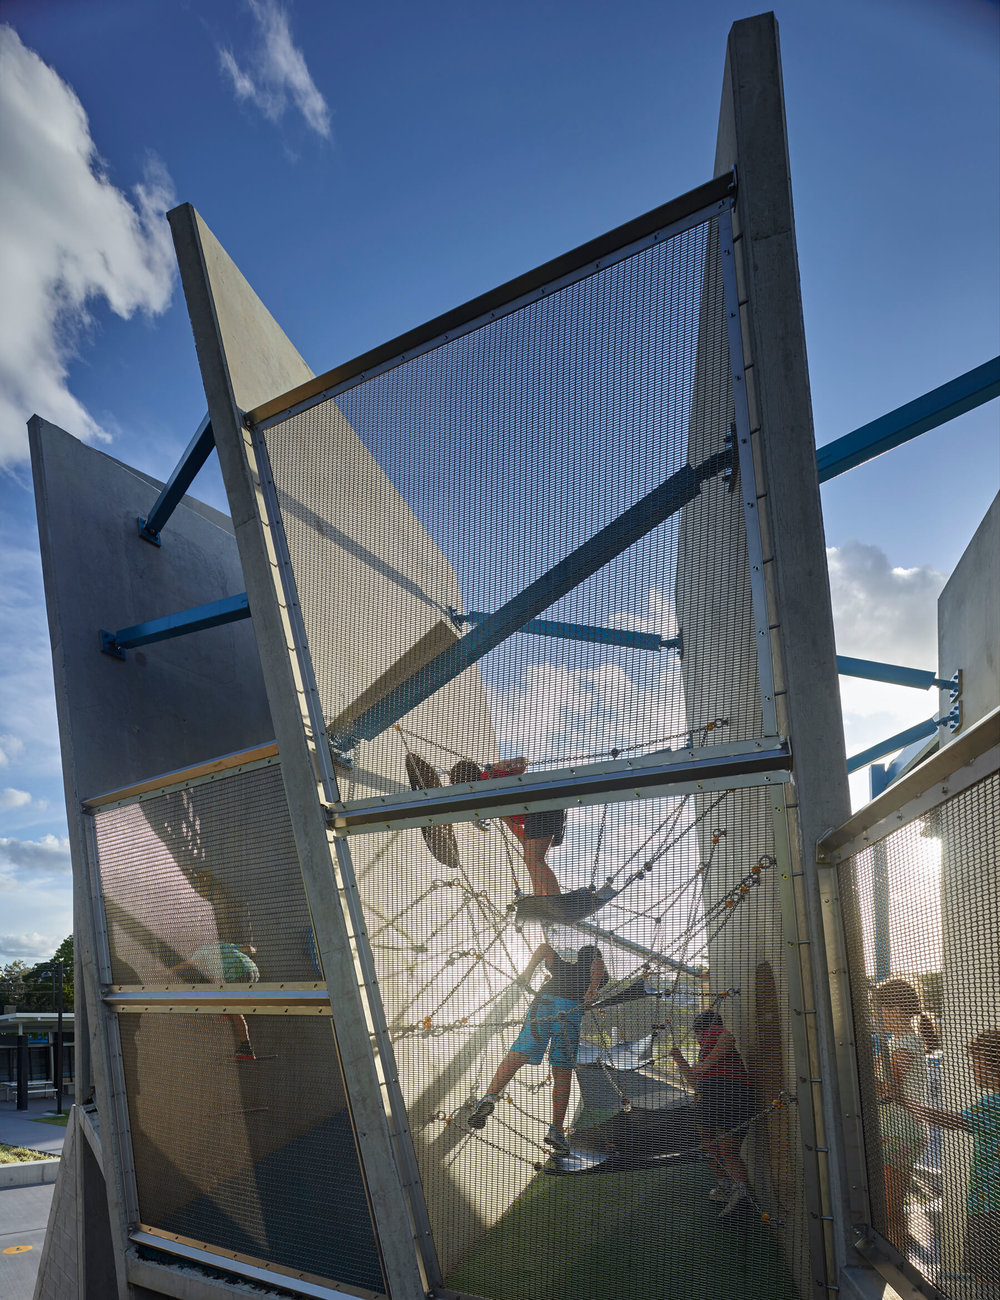 Frew-park-arena-playground-guymer-bailey-12.jpg